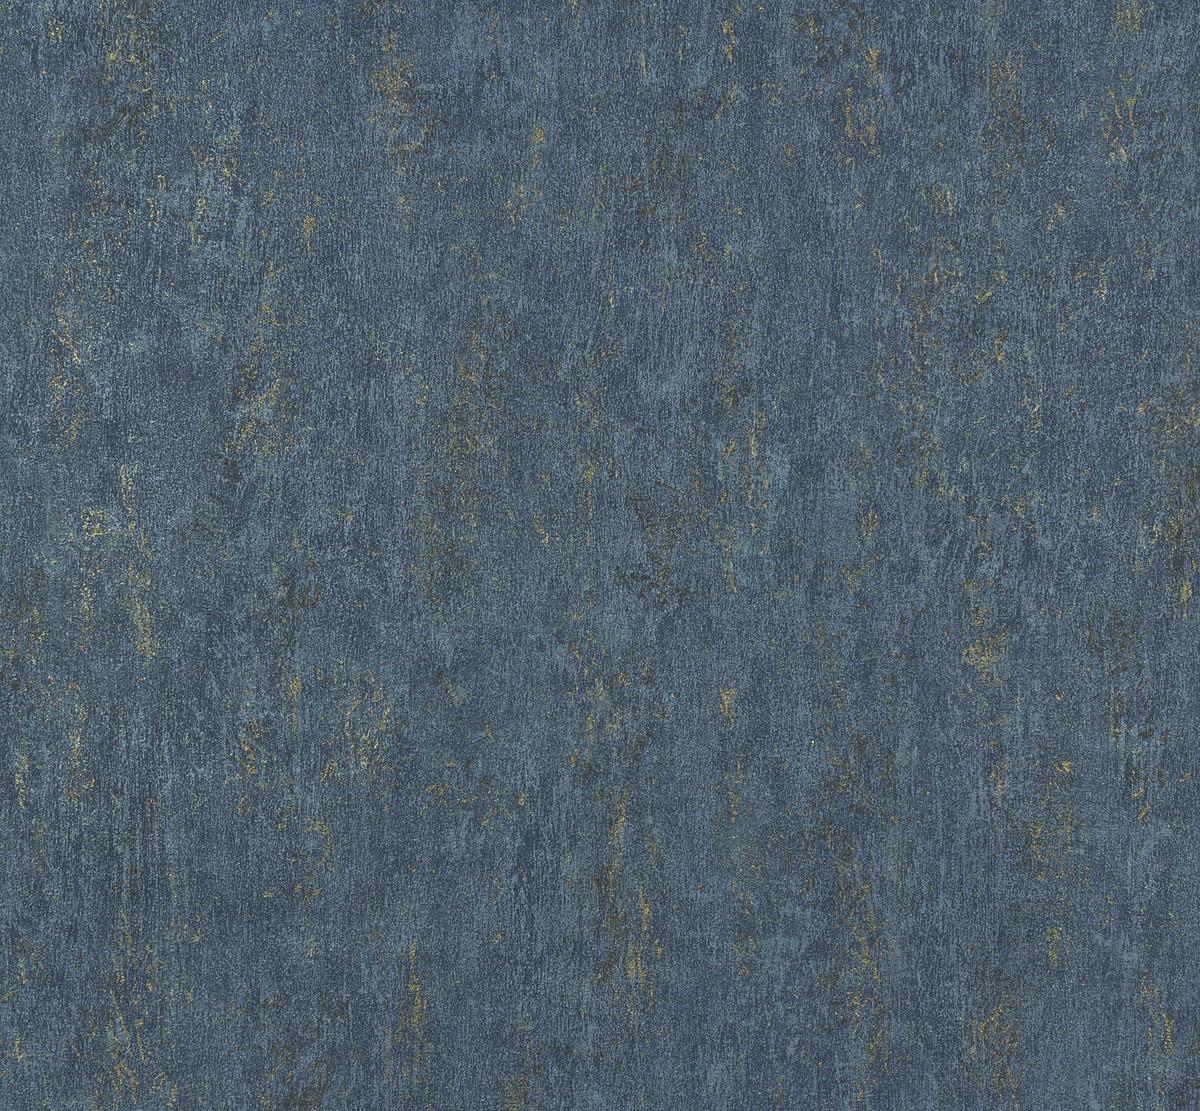 P.S Origin 42107-60 Tapete Vlies Modern Beton Optik blau ...